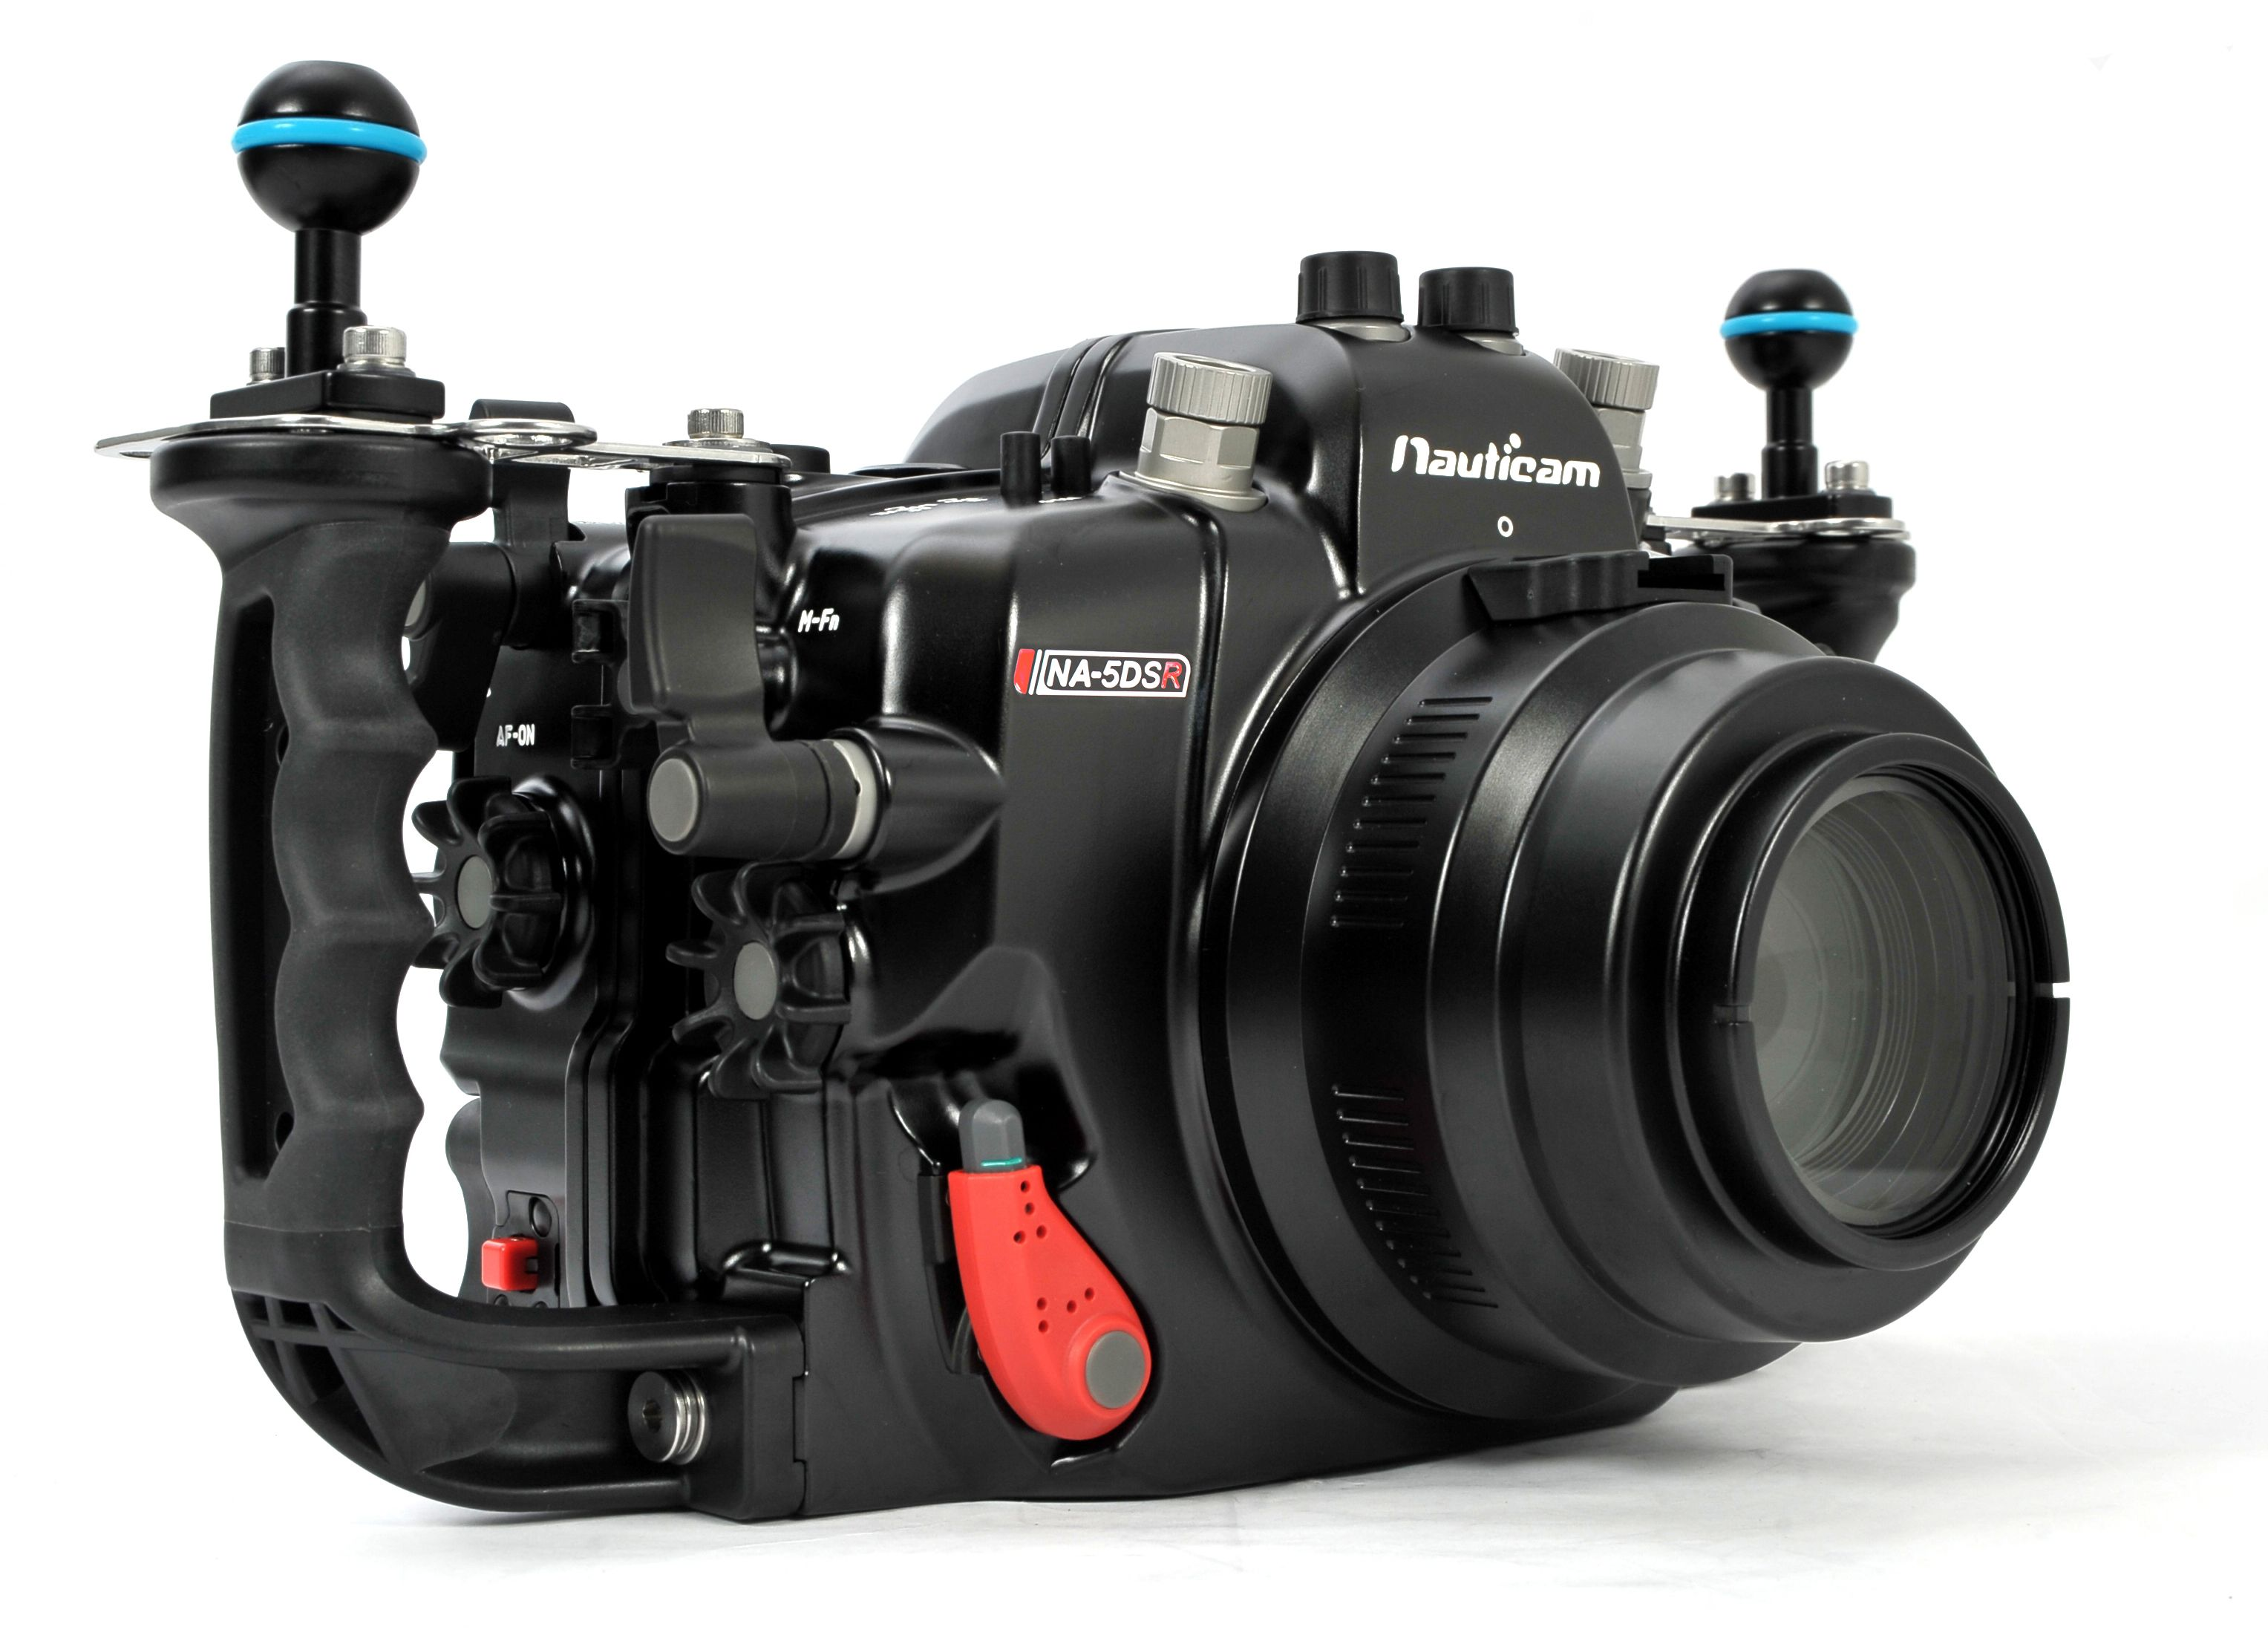 Nauticam Canon 5ds 5ds R Underwater Housing Underwater House Canon 5ds Camera